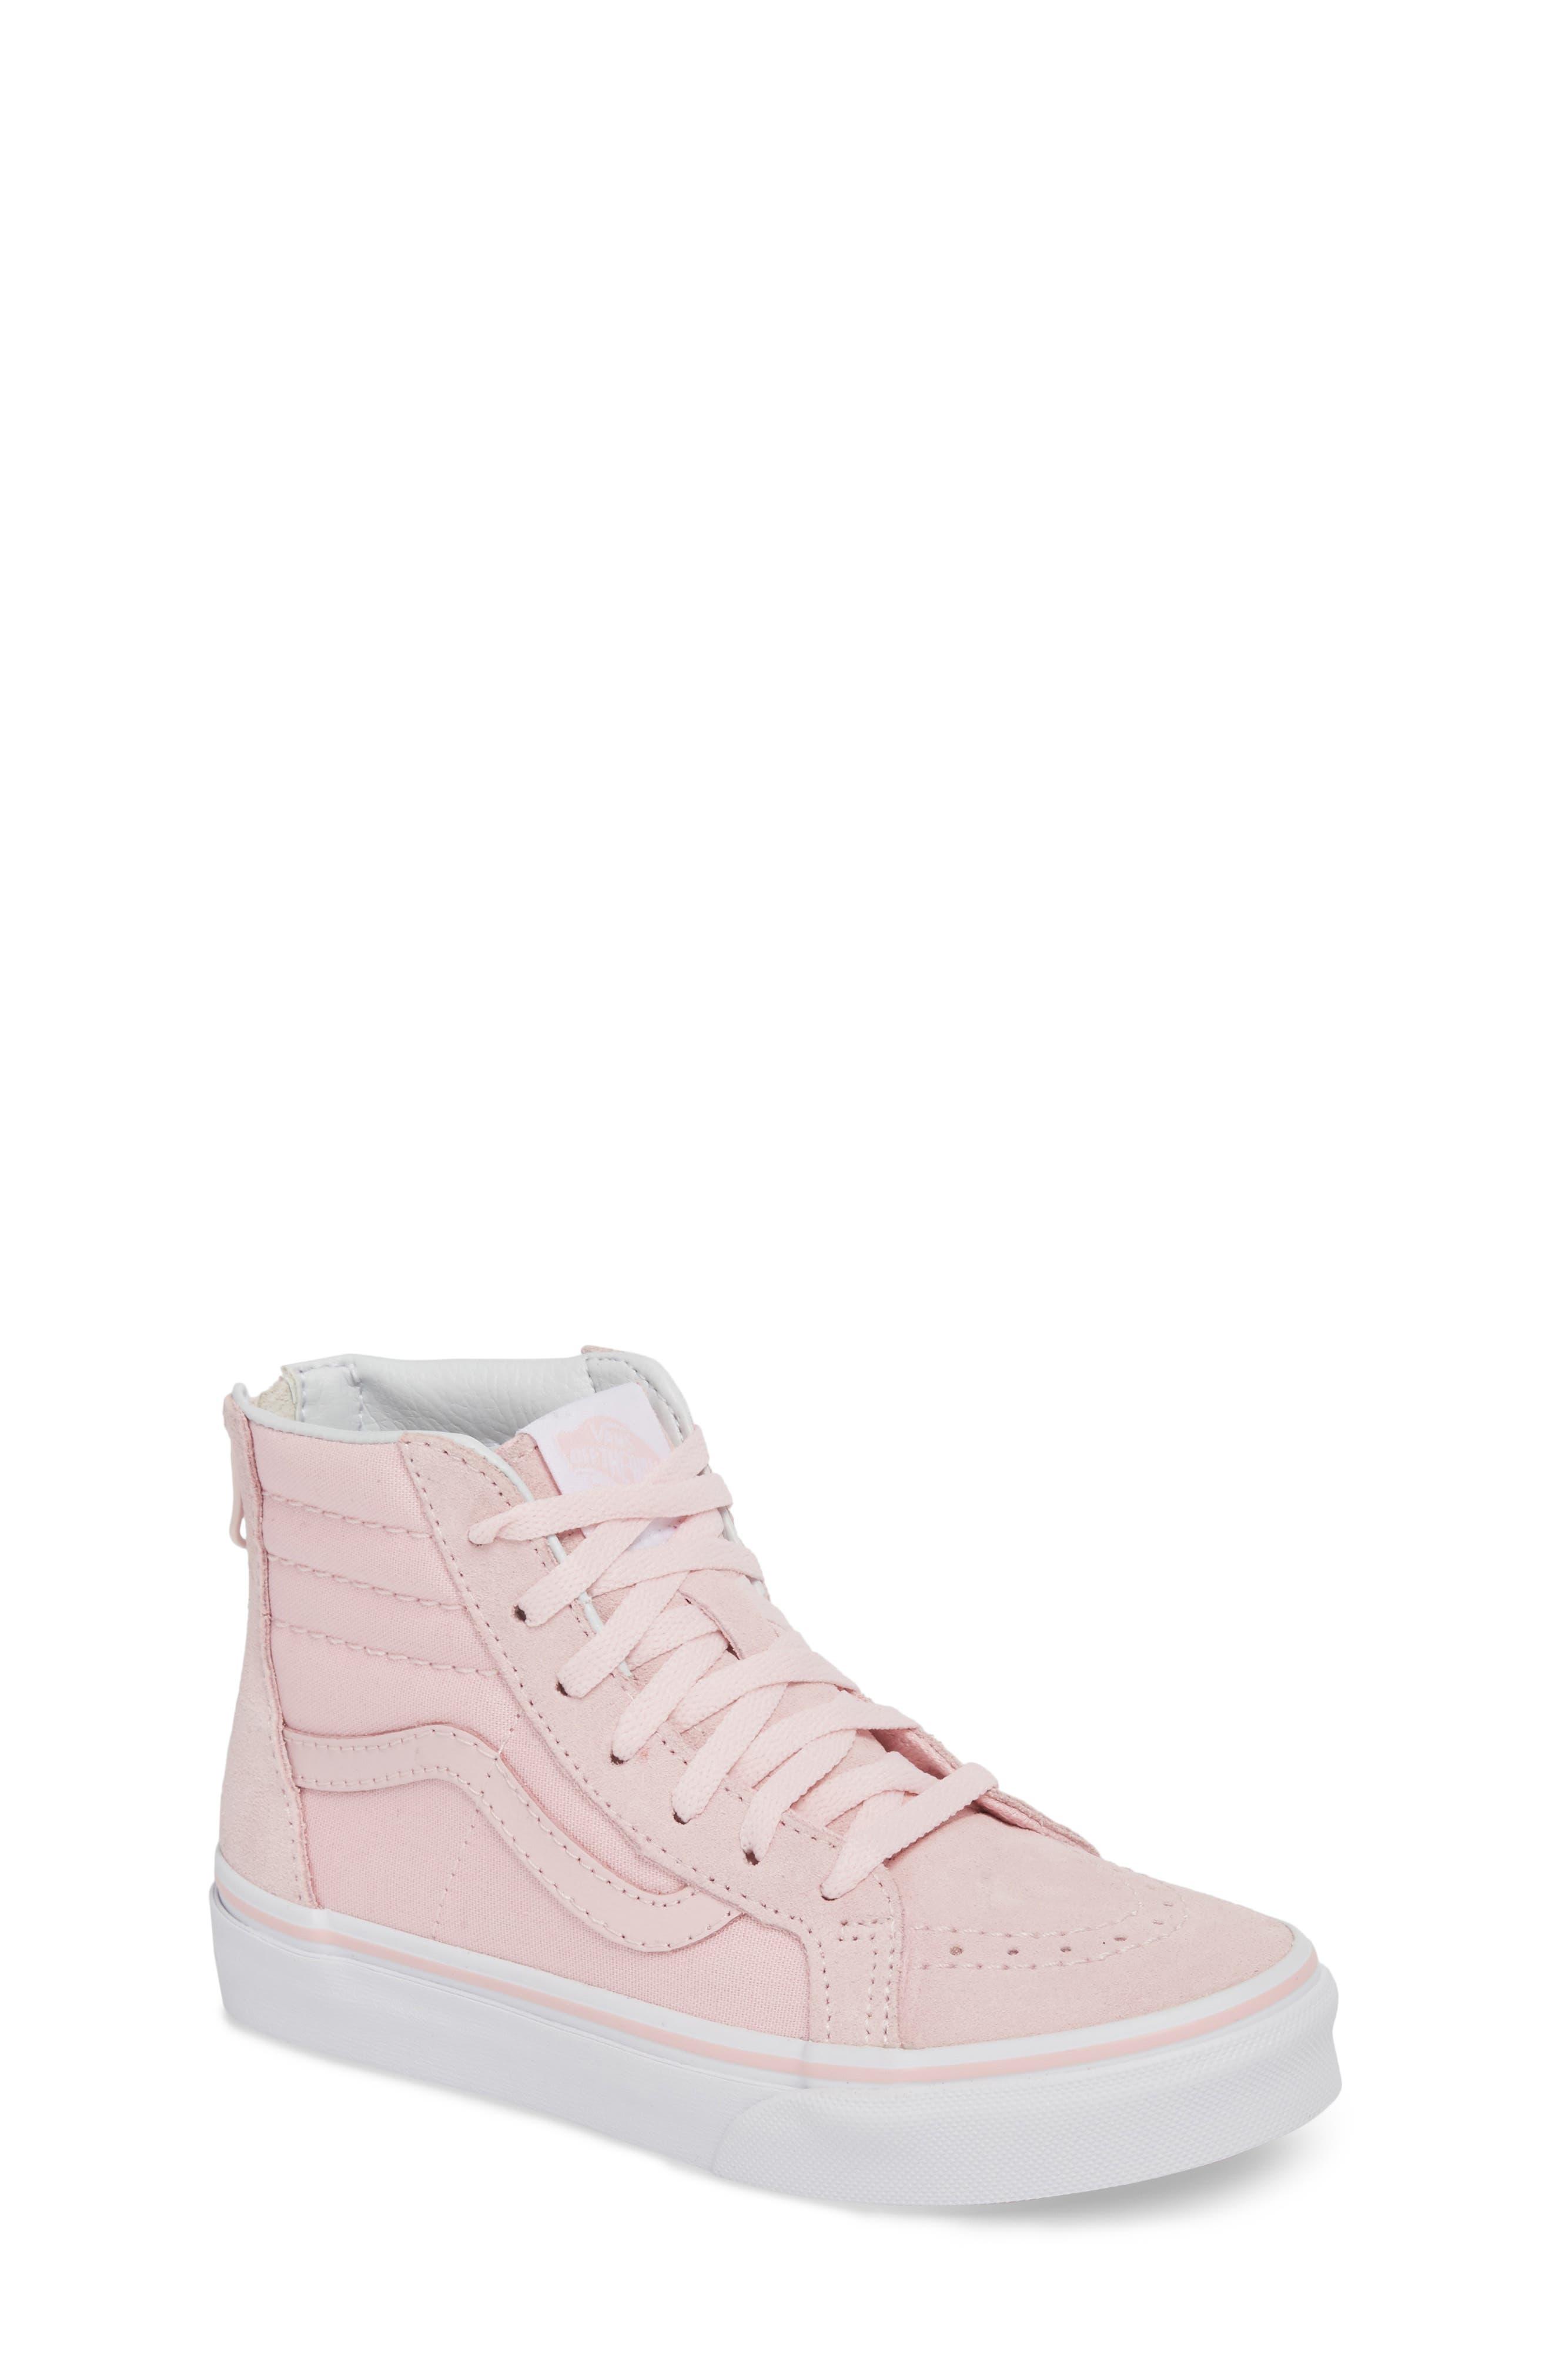 Sk8-Hi Zip Sneaker,                         Main,                         color, CHALK PINK/ TRUE WHITE